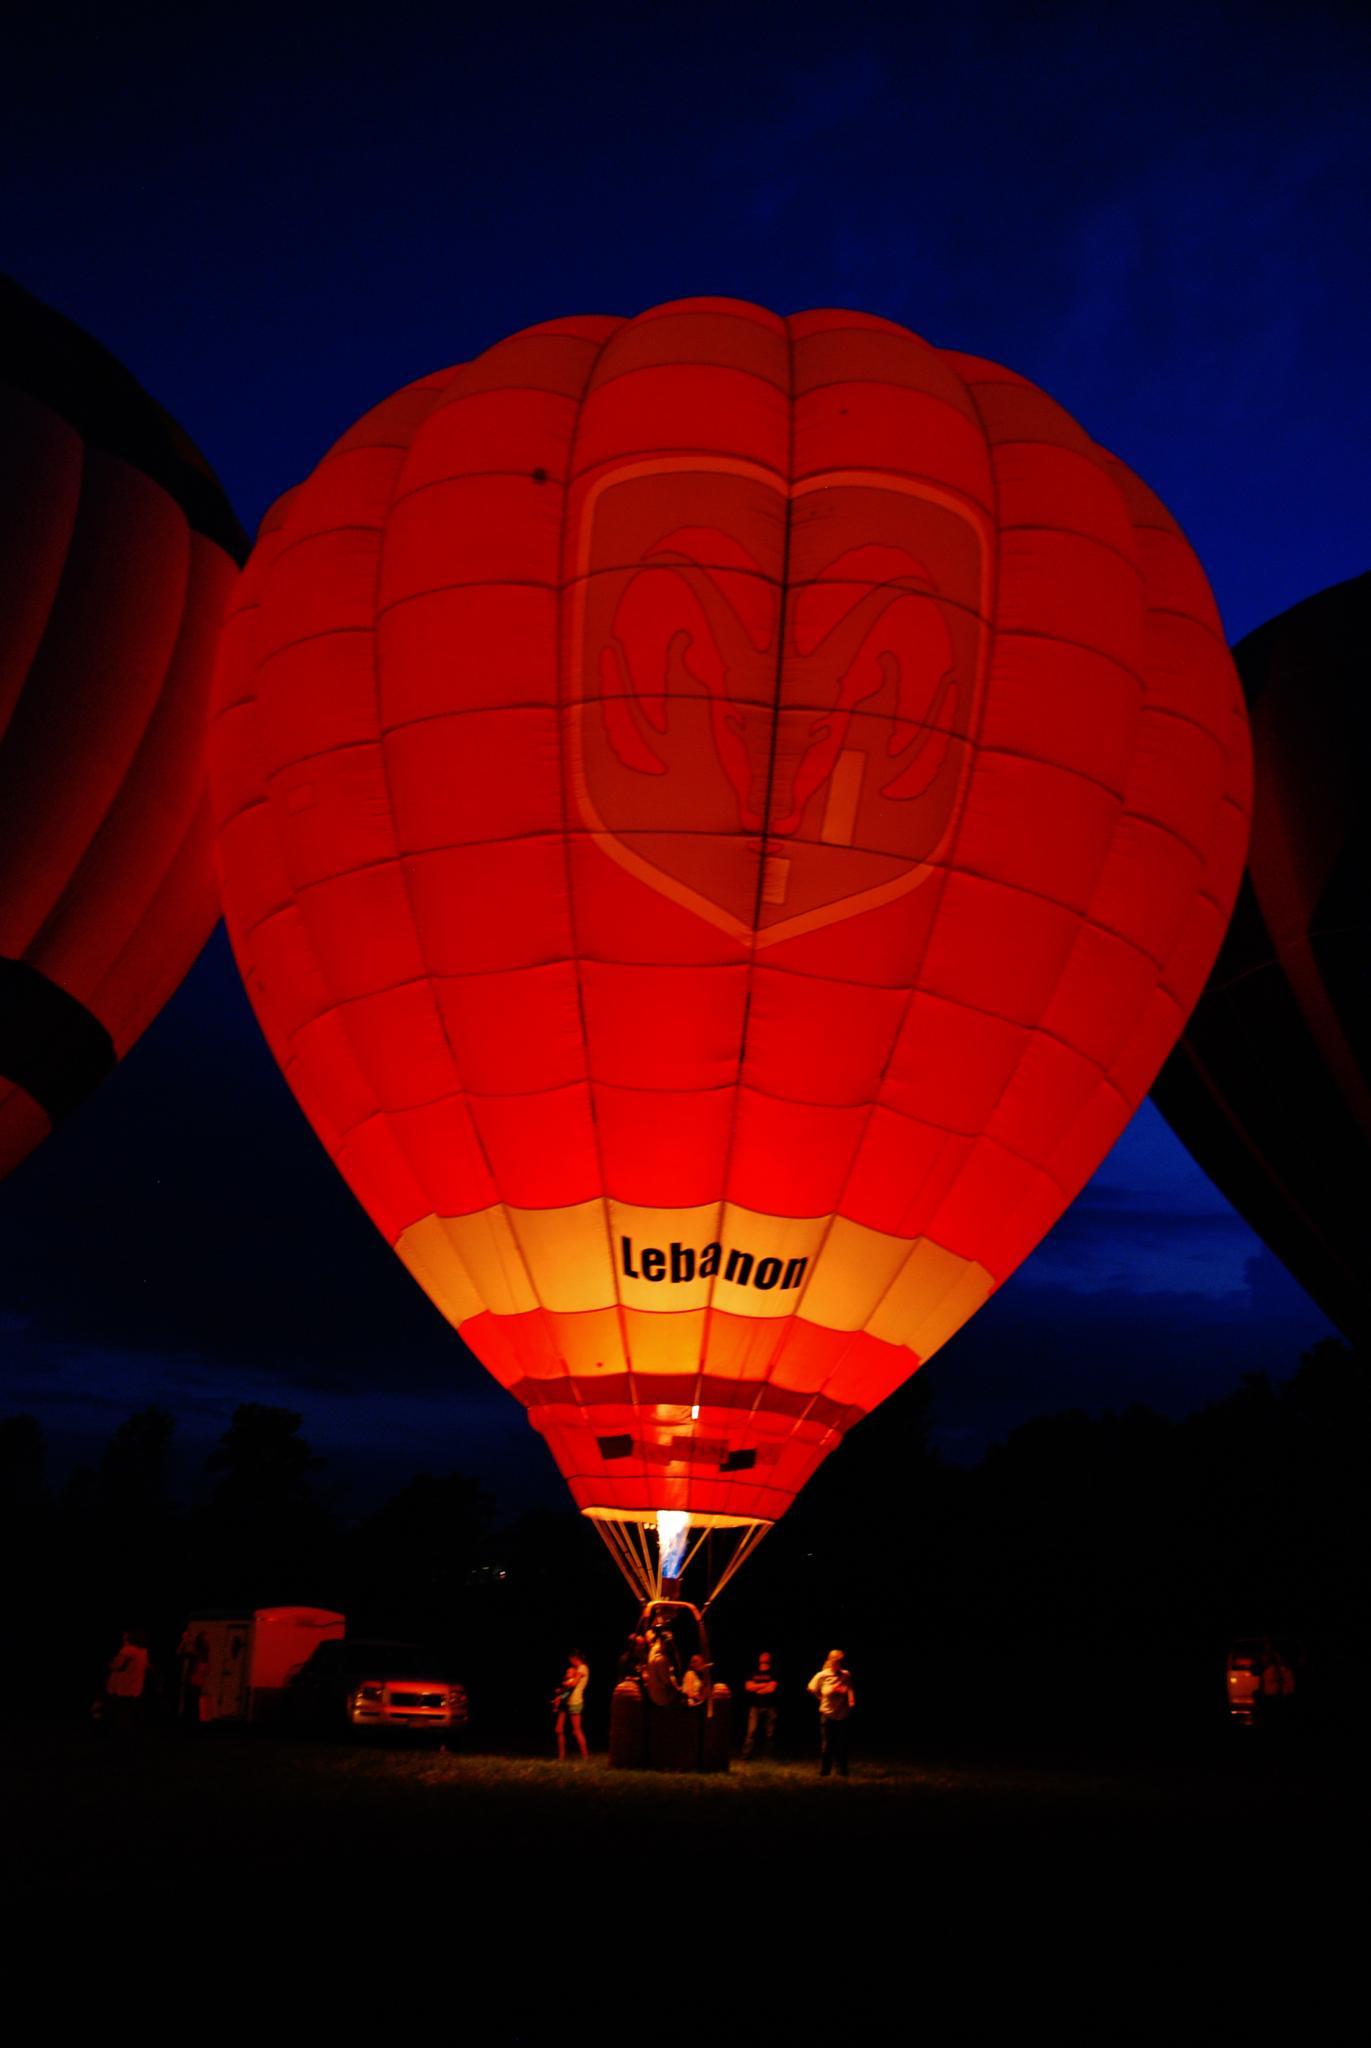 Hot Air Balloon by Doug Fosnight